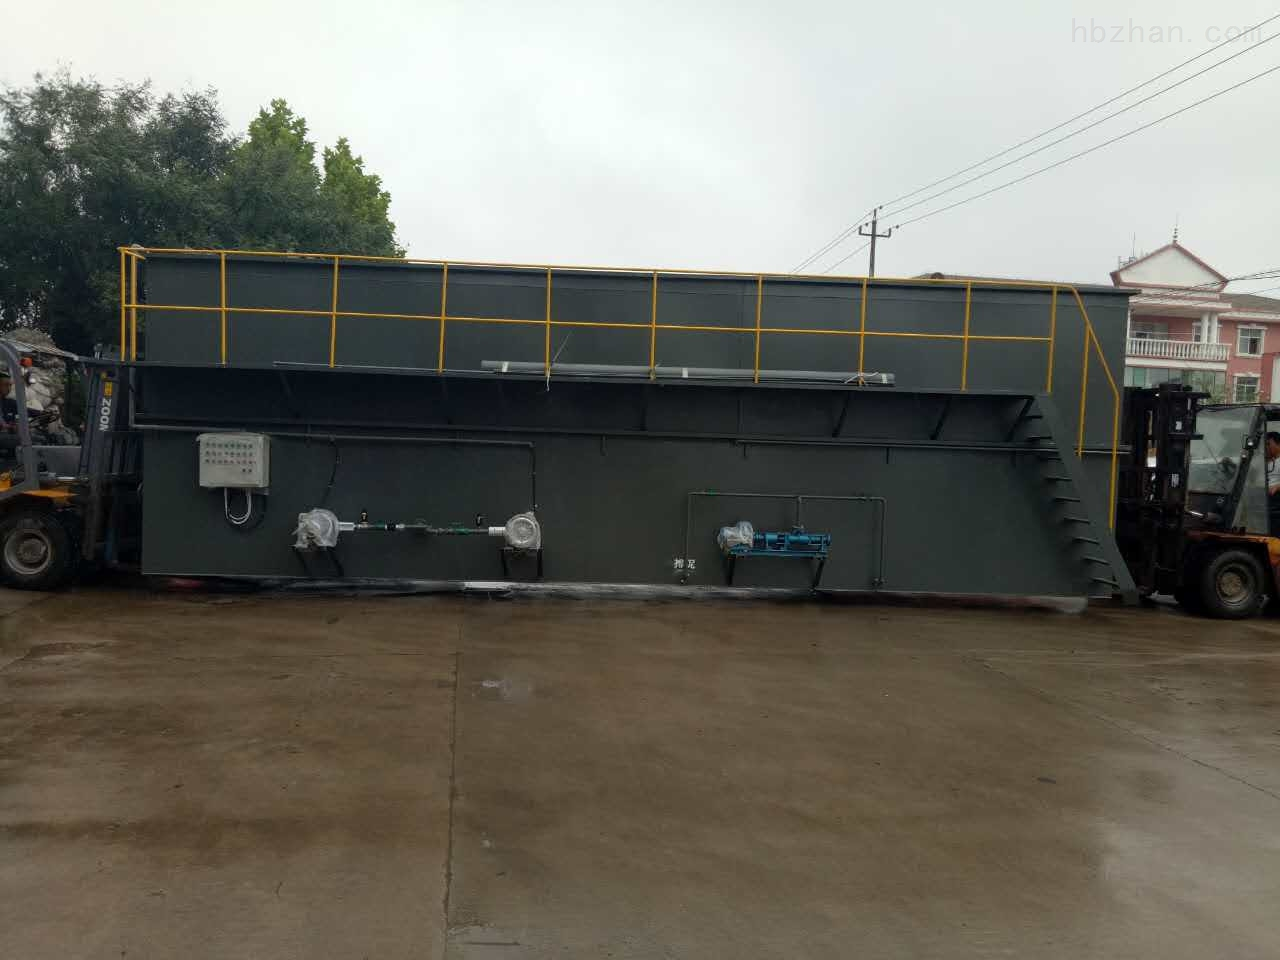 MBR醫院污水處理工藝